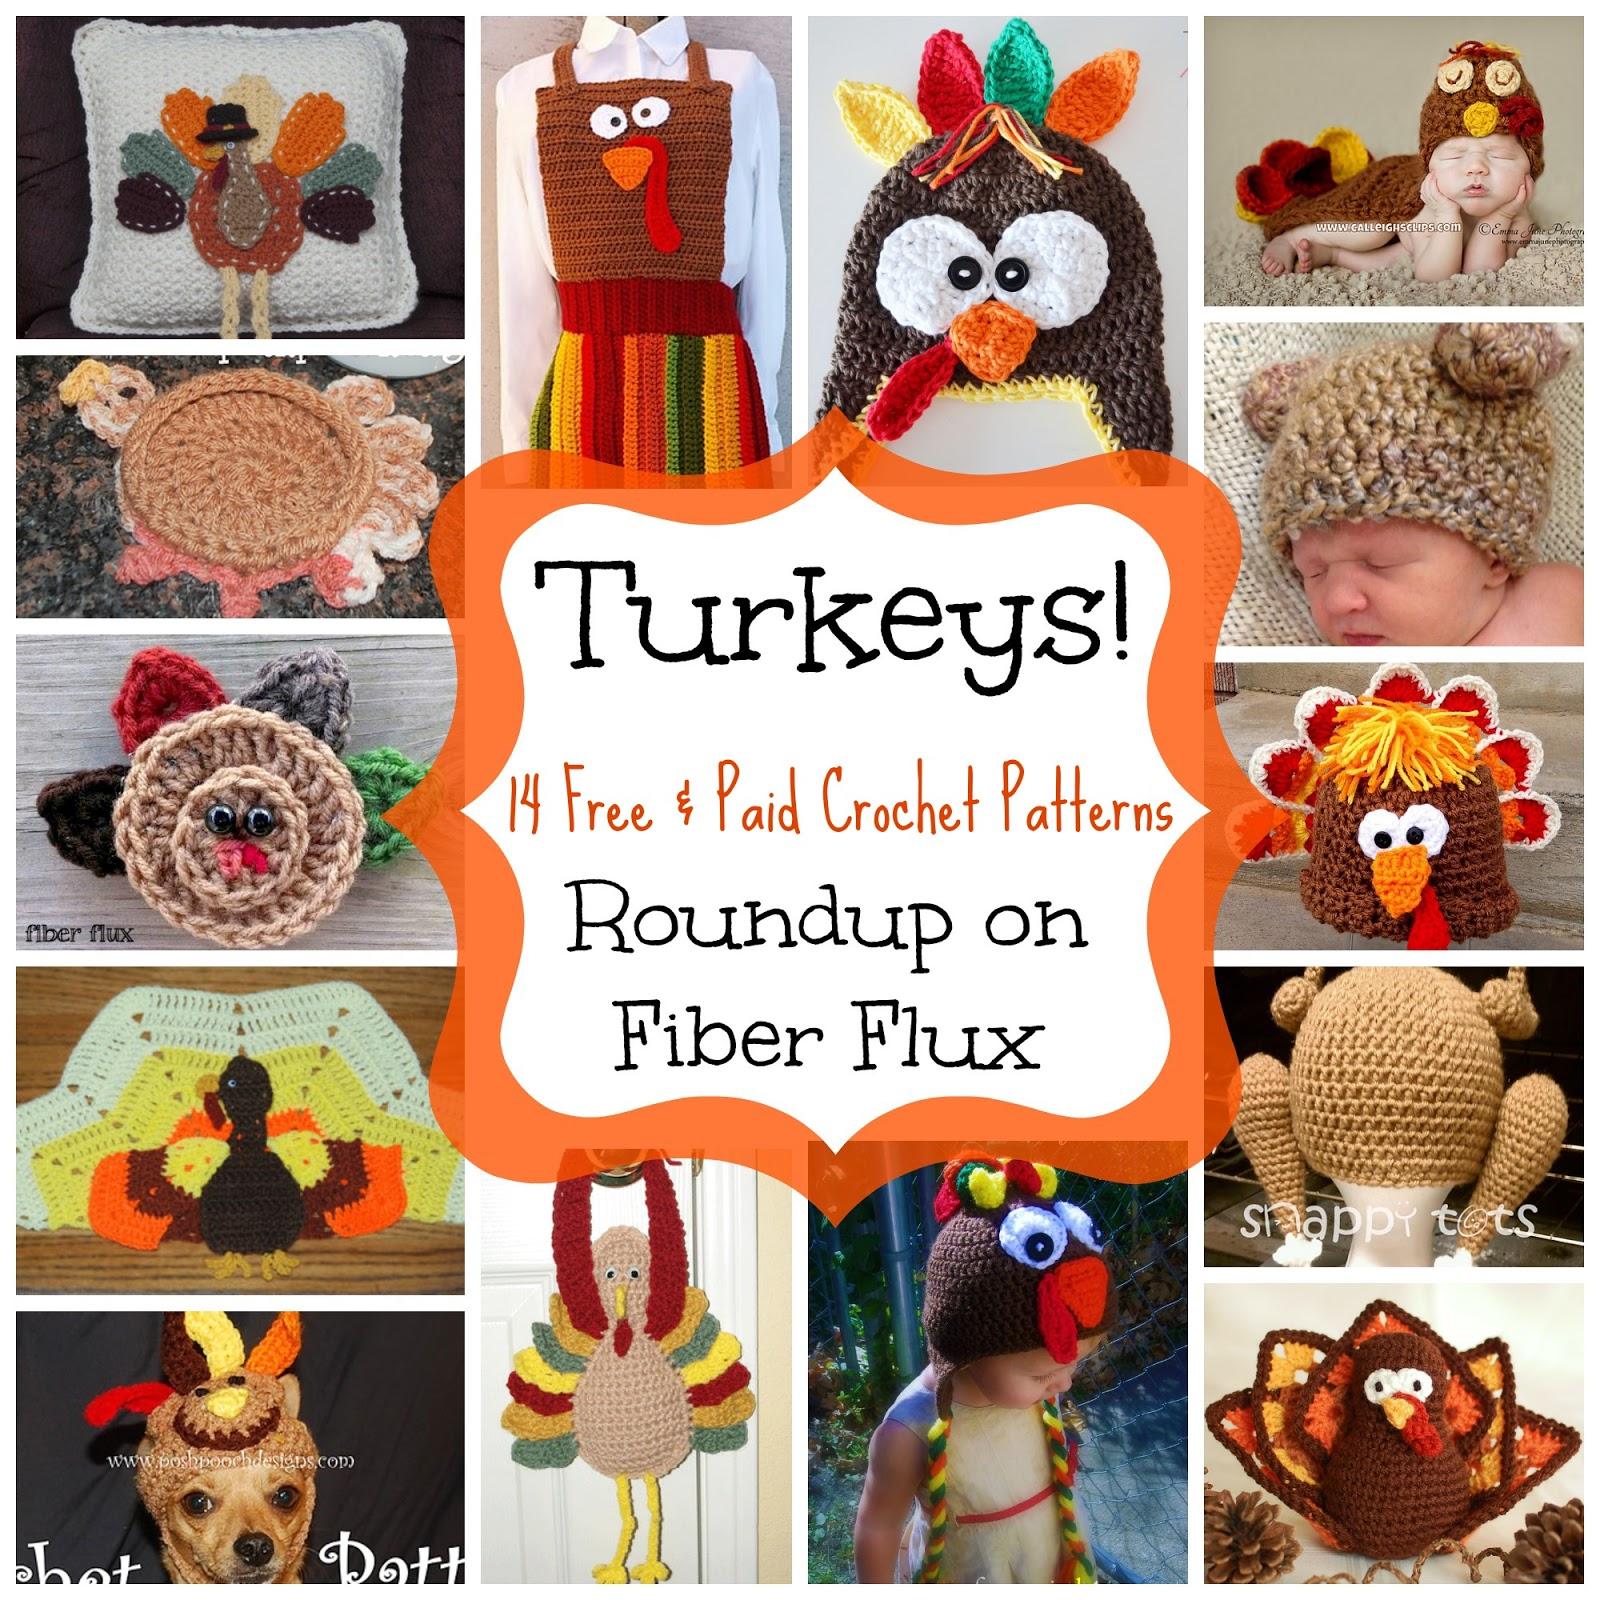 Fiber Flux Turkeys 14 Free And Paid Crochet Patterns